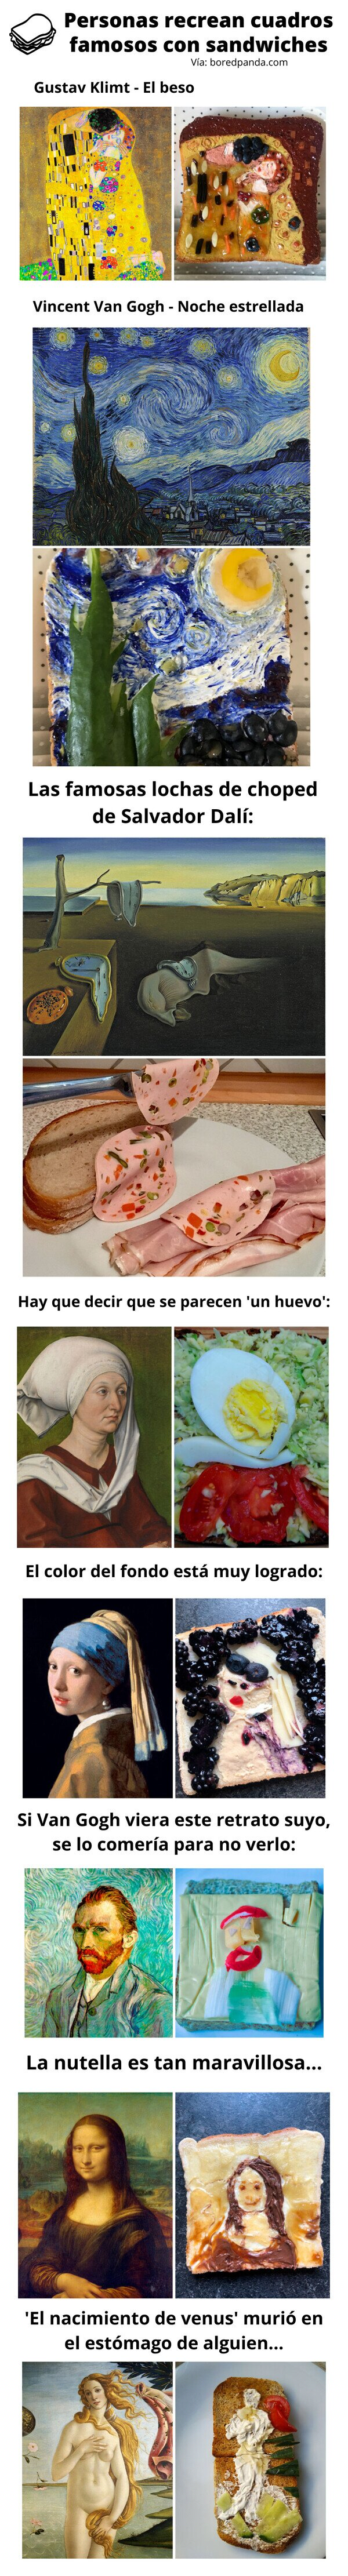 Meme_otros - Personas recrean cuadros famosos con sandwiches